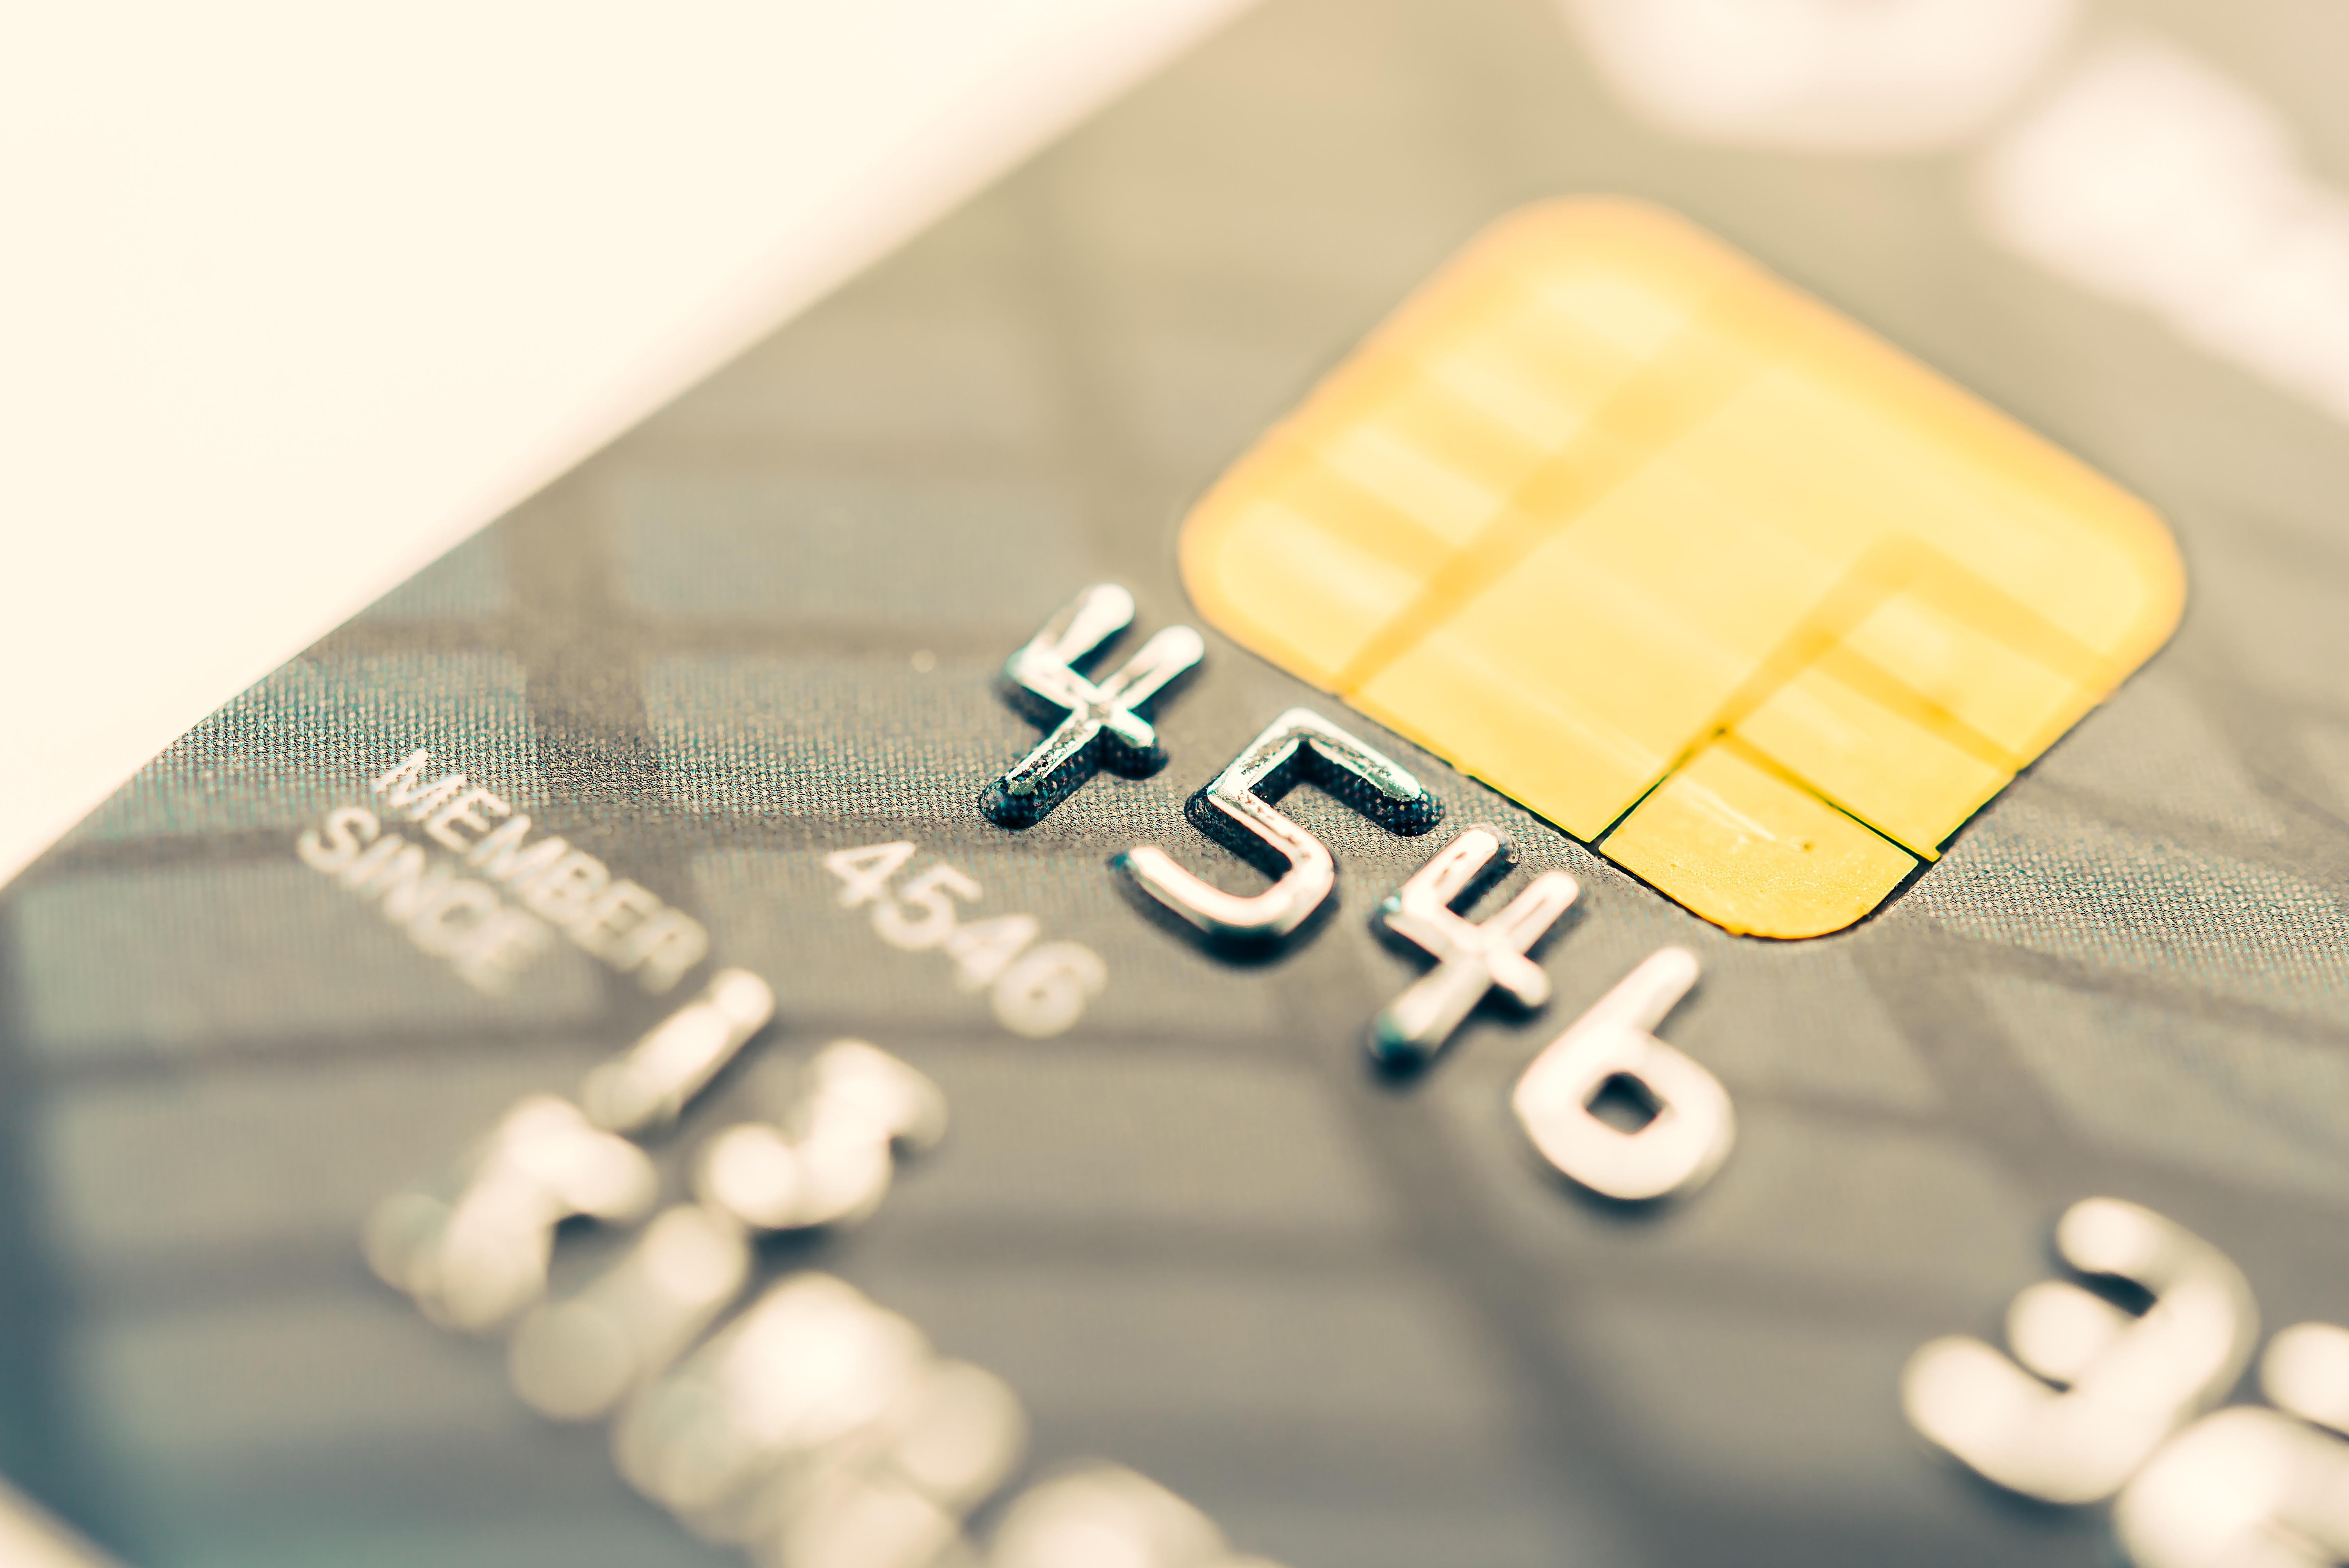 the-new-visa-europe-mandate-for-risk-based-pci-dss-compliance.jpg